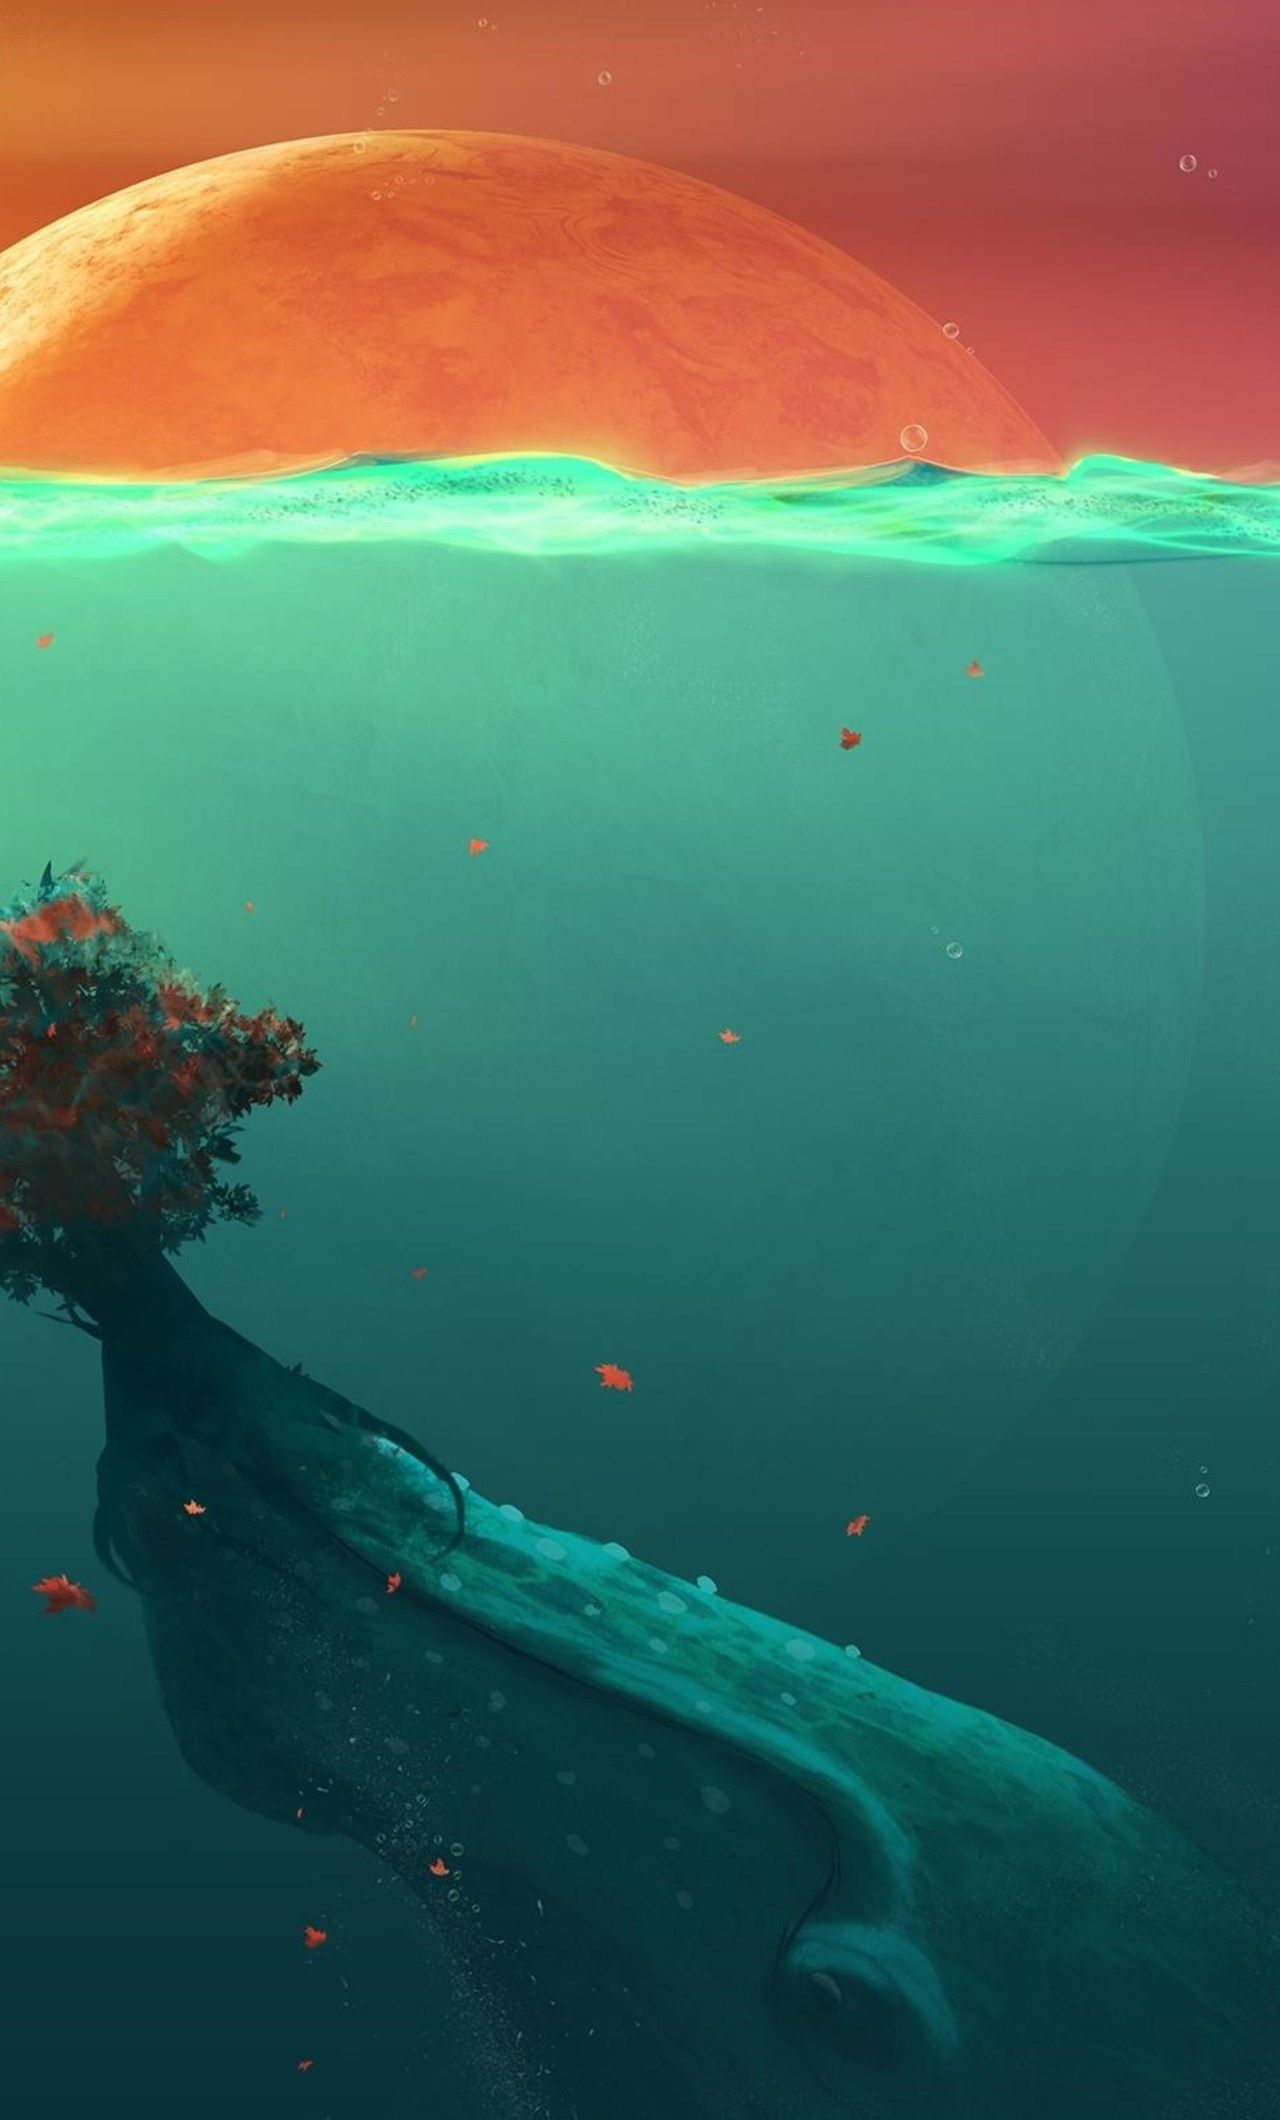 Deep Water Wallpaper 616435 Iphone 7 Wallpapers World